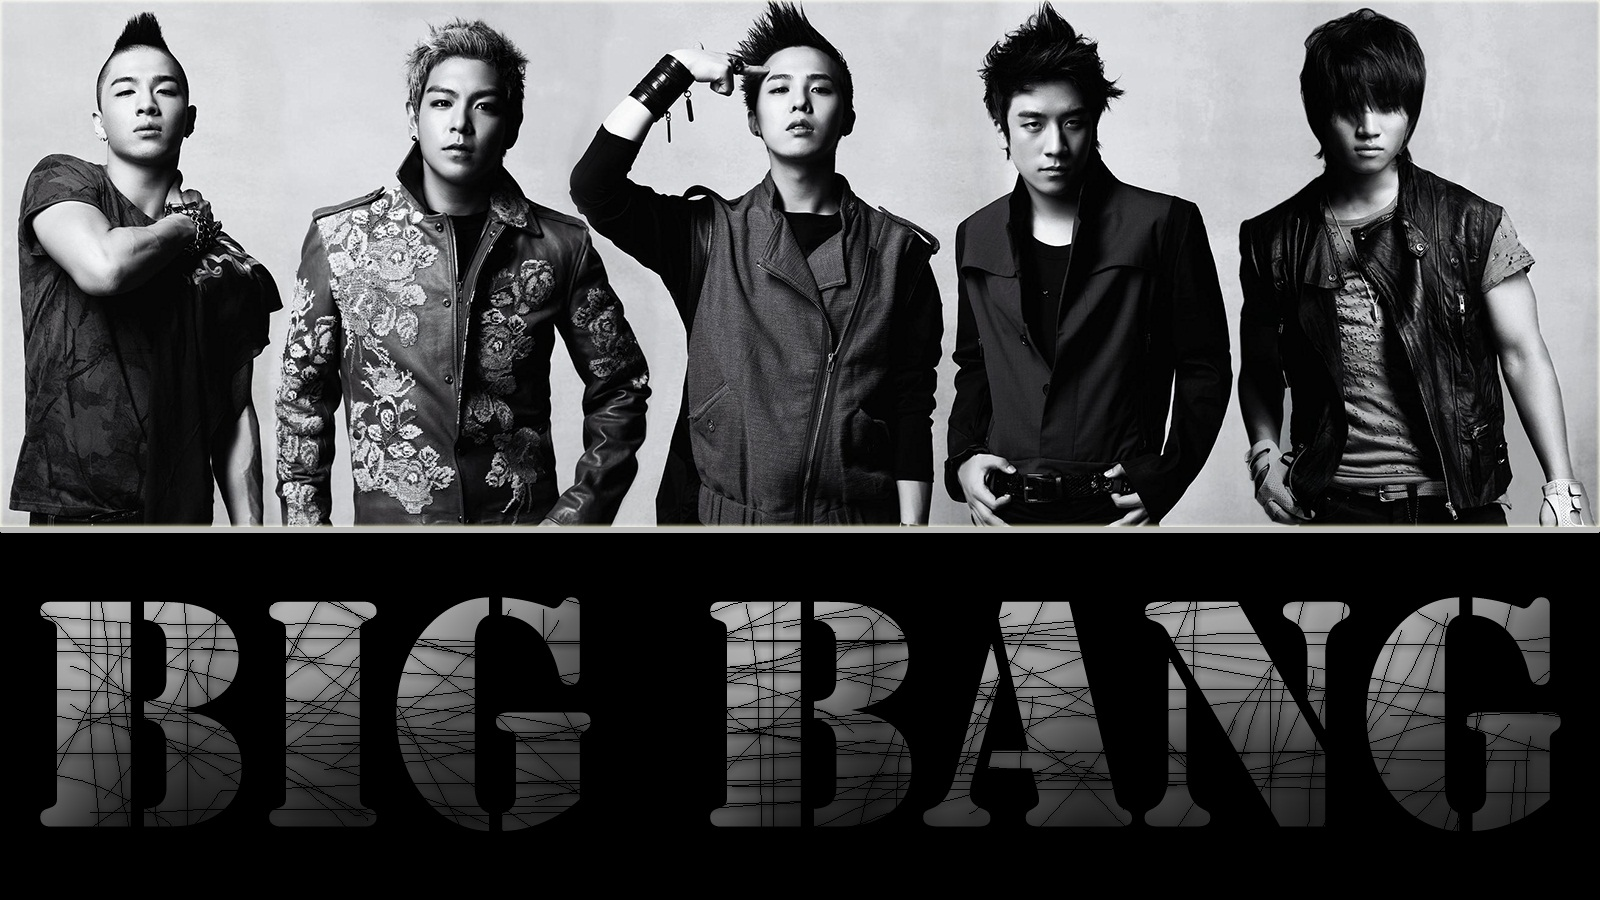 big bang 빅뱅 bigbang wallpaper hd 9 big bang 빅뱅